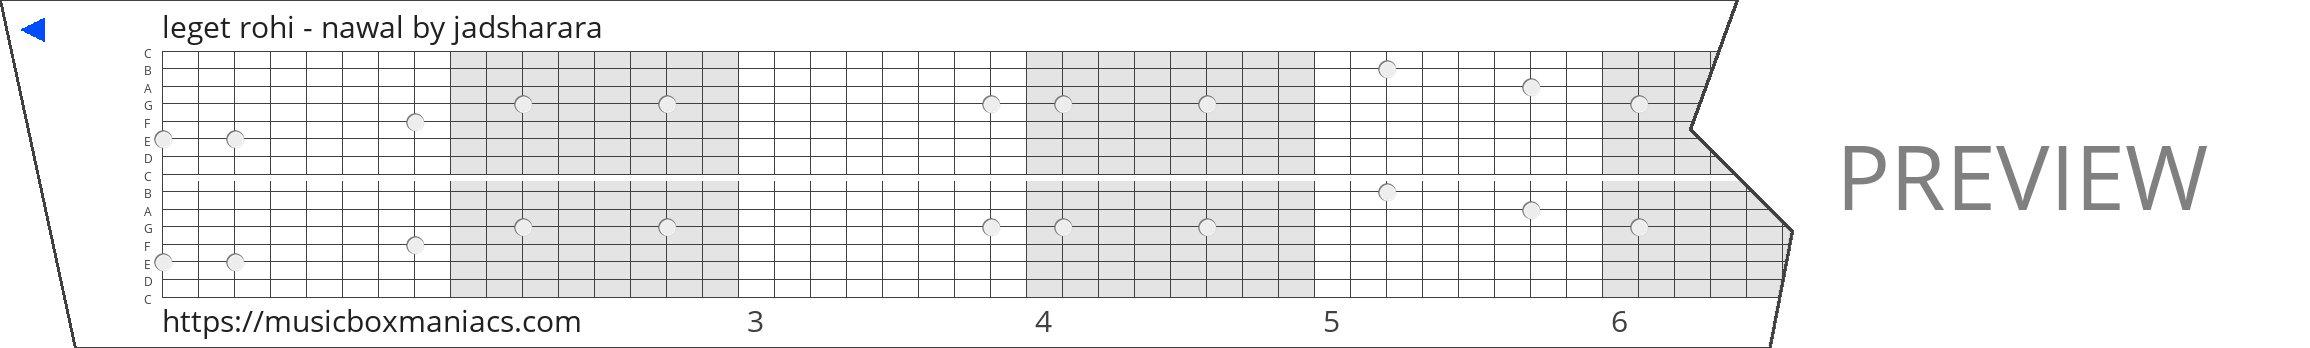 leget rohi - nawal 15 note music box paper strip